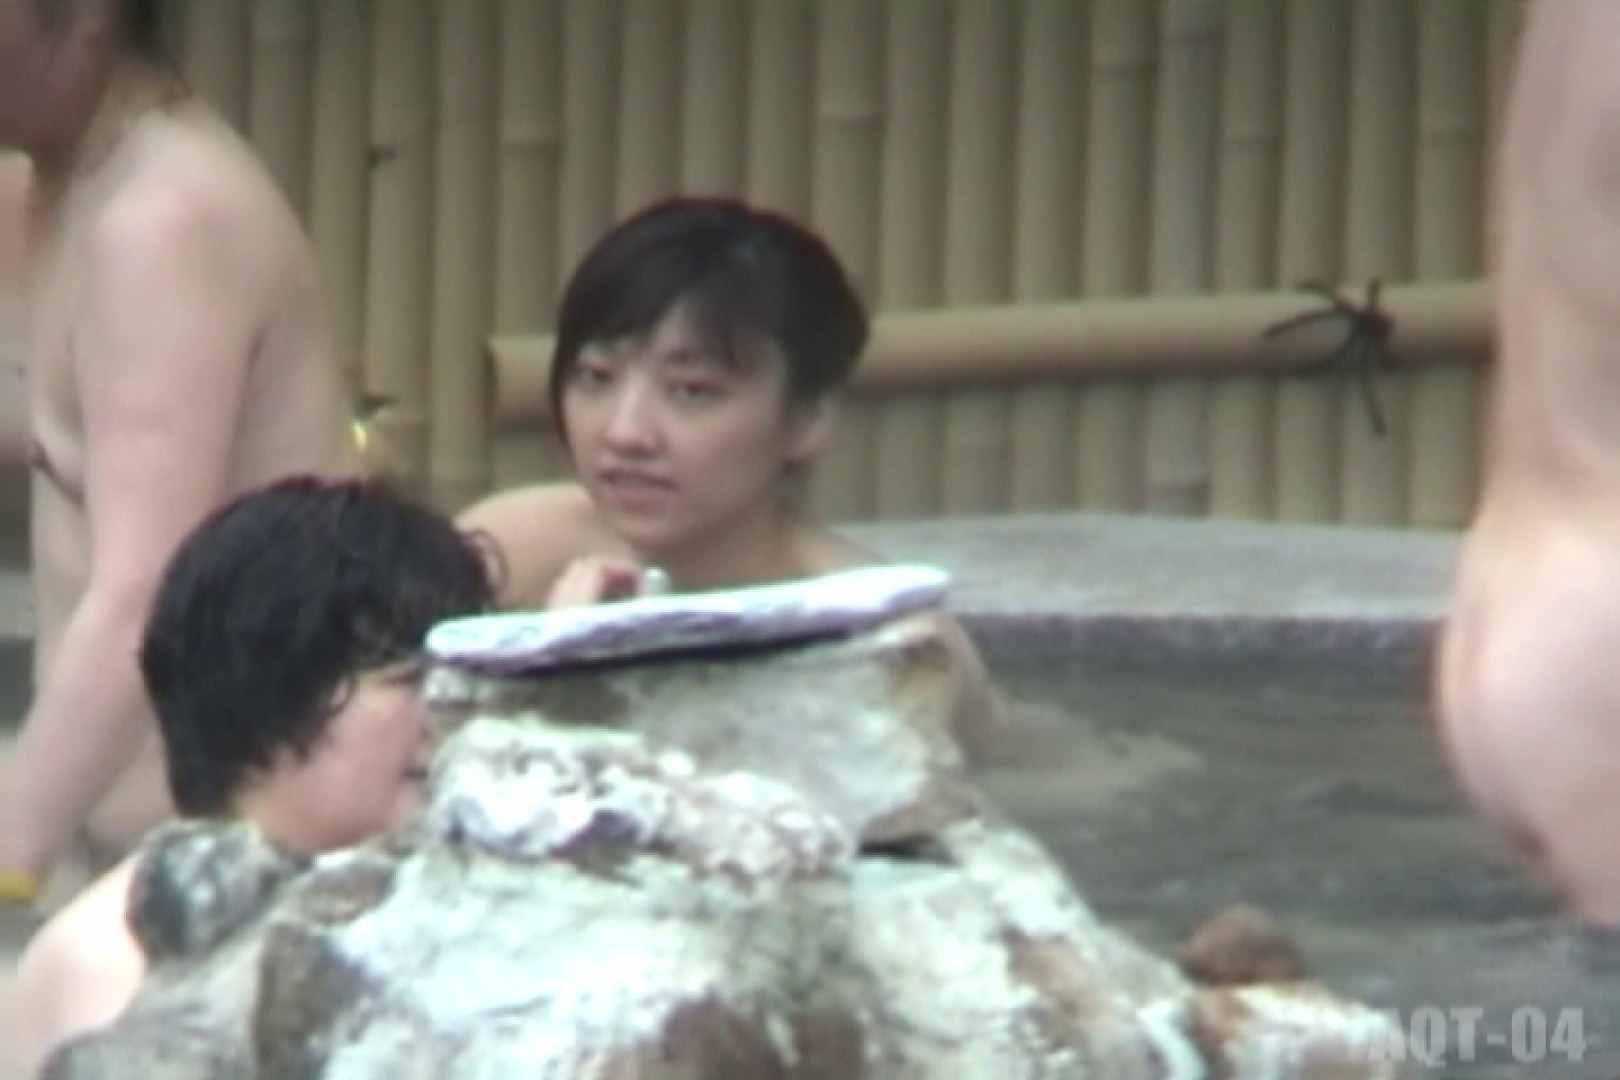 Aquaな露天風呂Vol.743 美しいOLの裸体 | 露天風呂突入  91pic 1